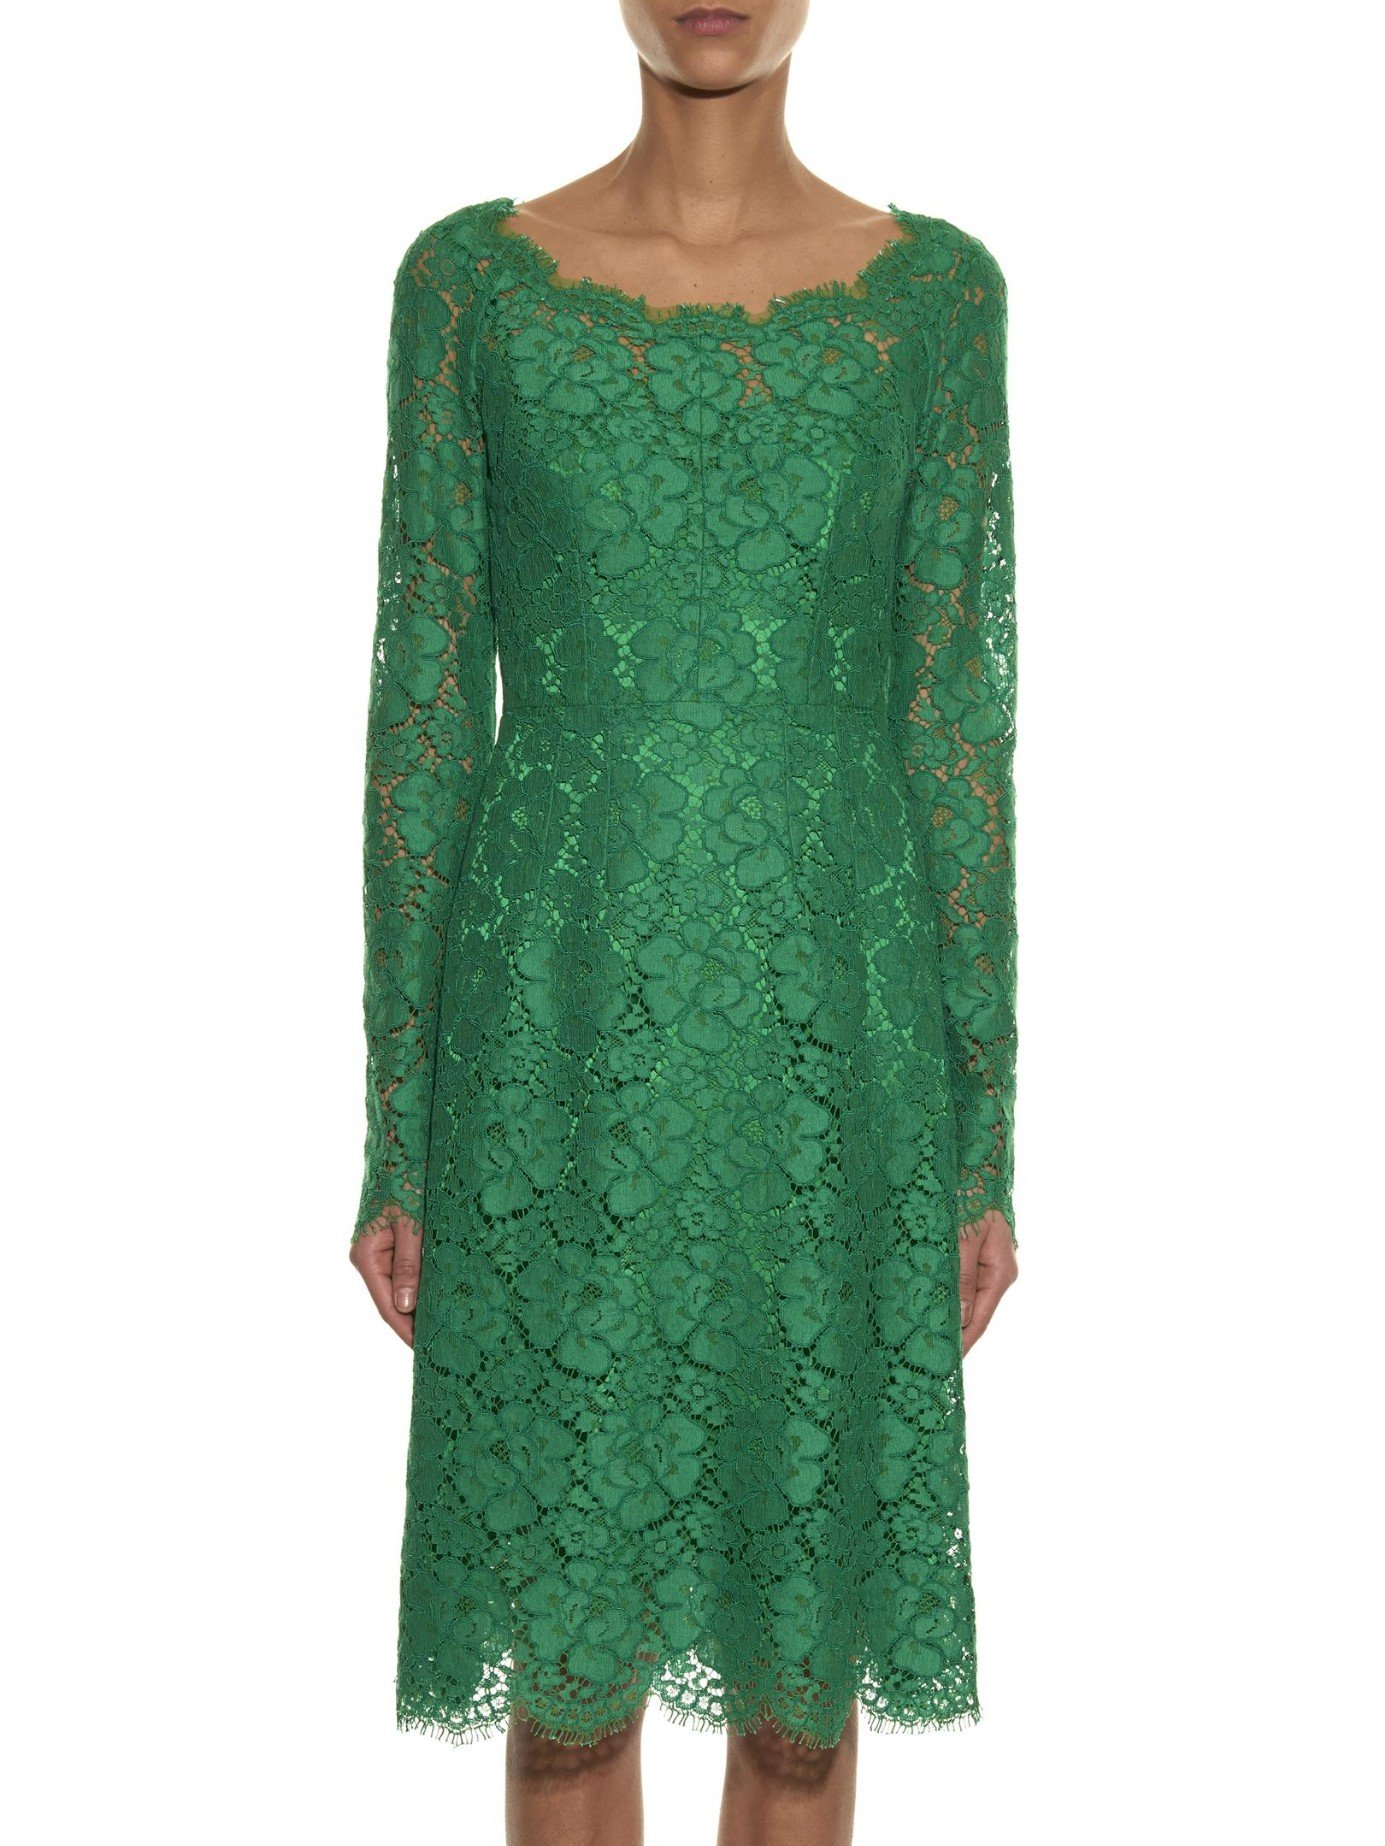 7b11e793 Dolce & Gabbana Boat-neck Lace Dress in Green - Lyst